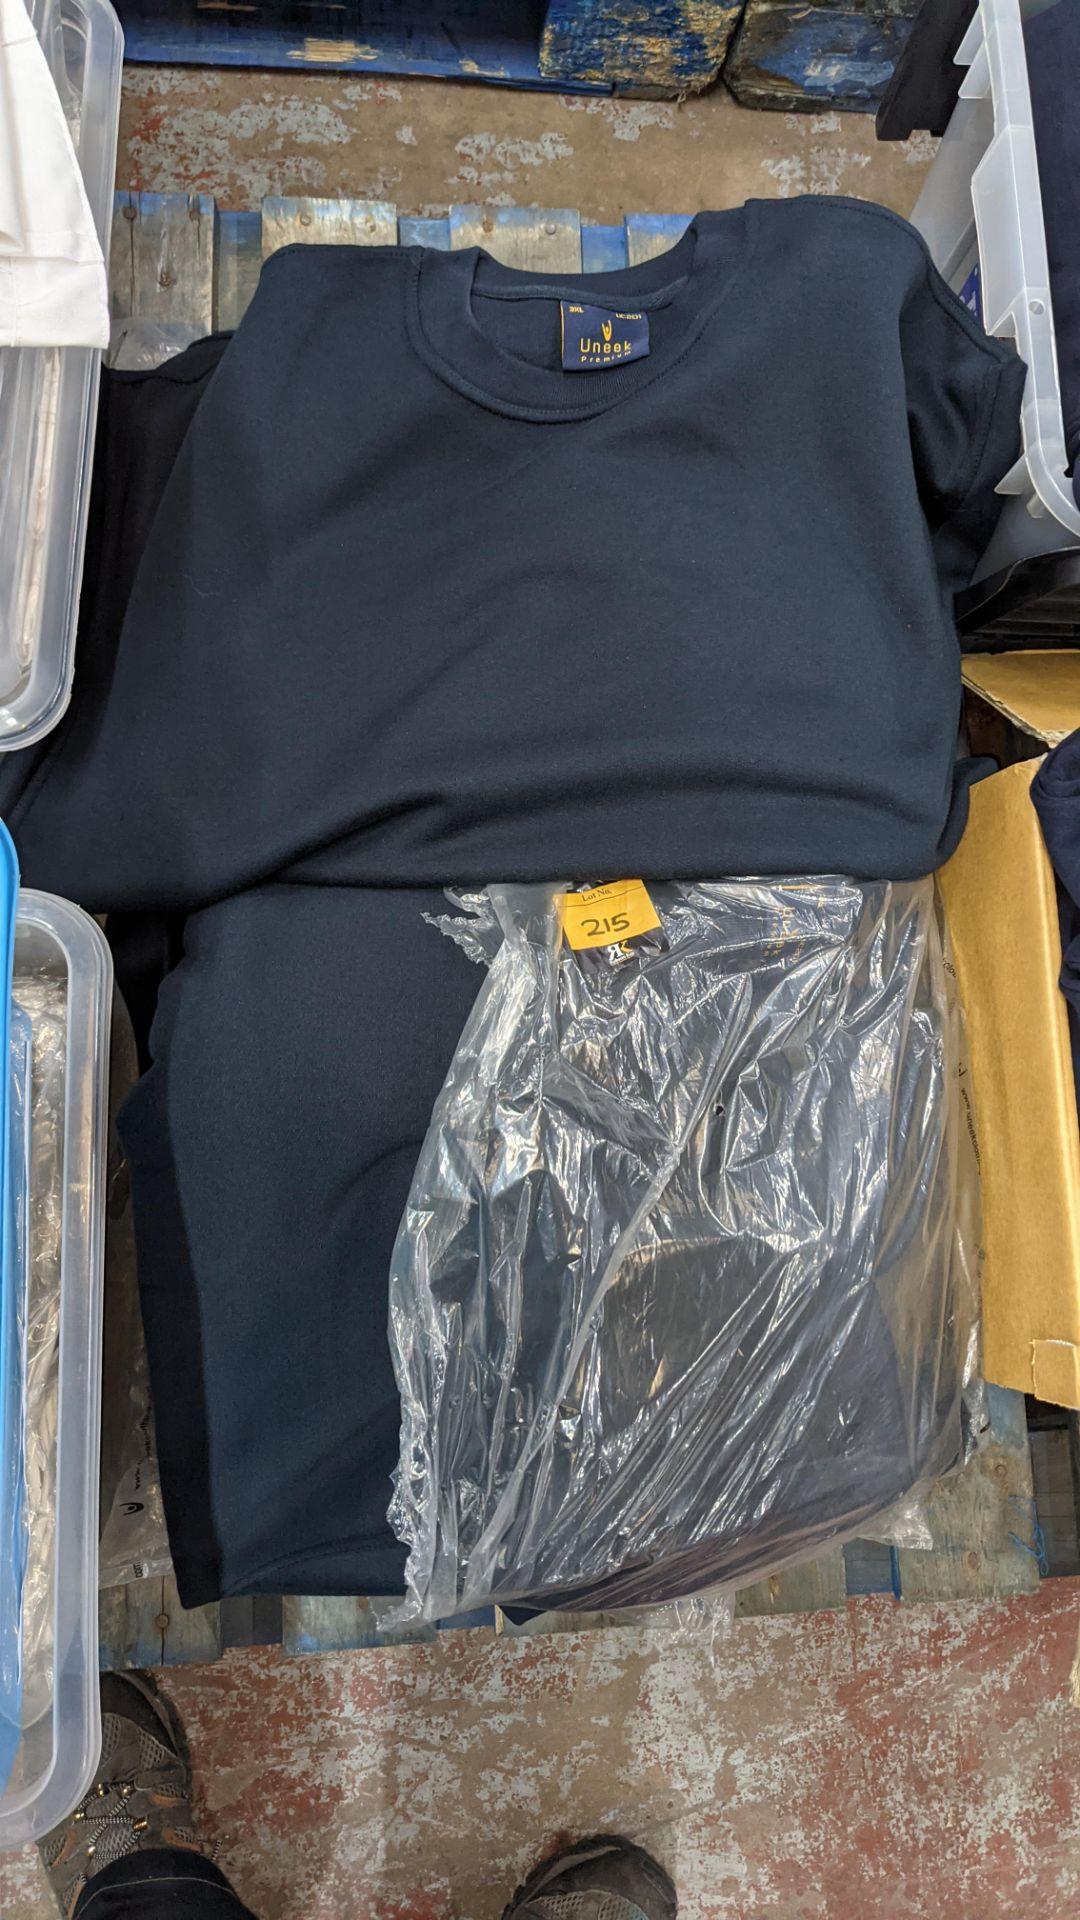 Approx 15 off Uneek dark blue sweatshirts - 2 bags - Image 3 of 5